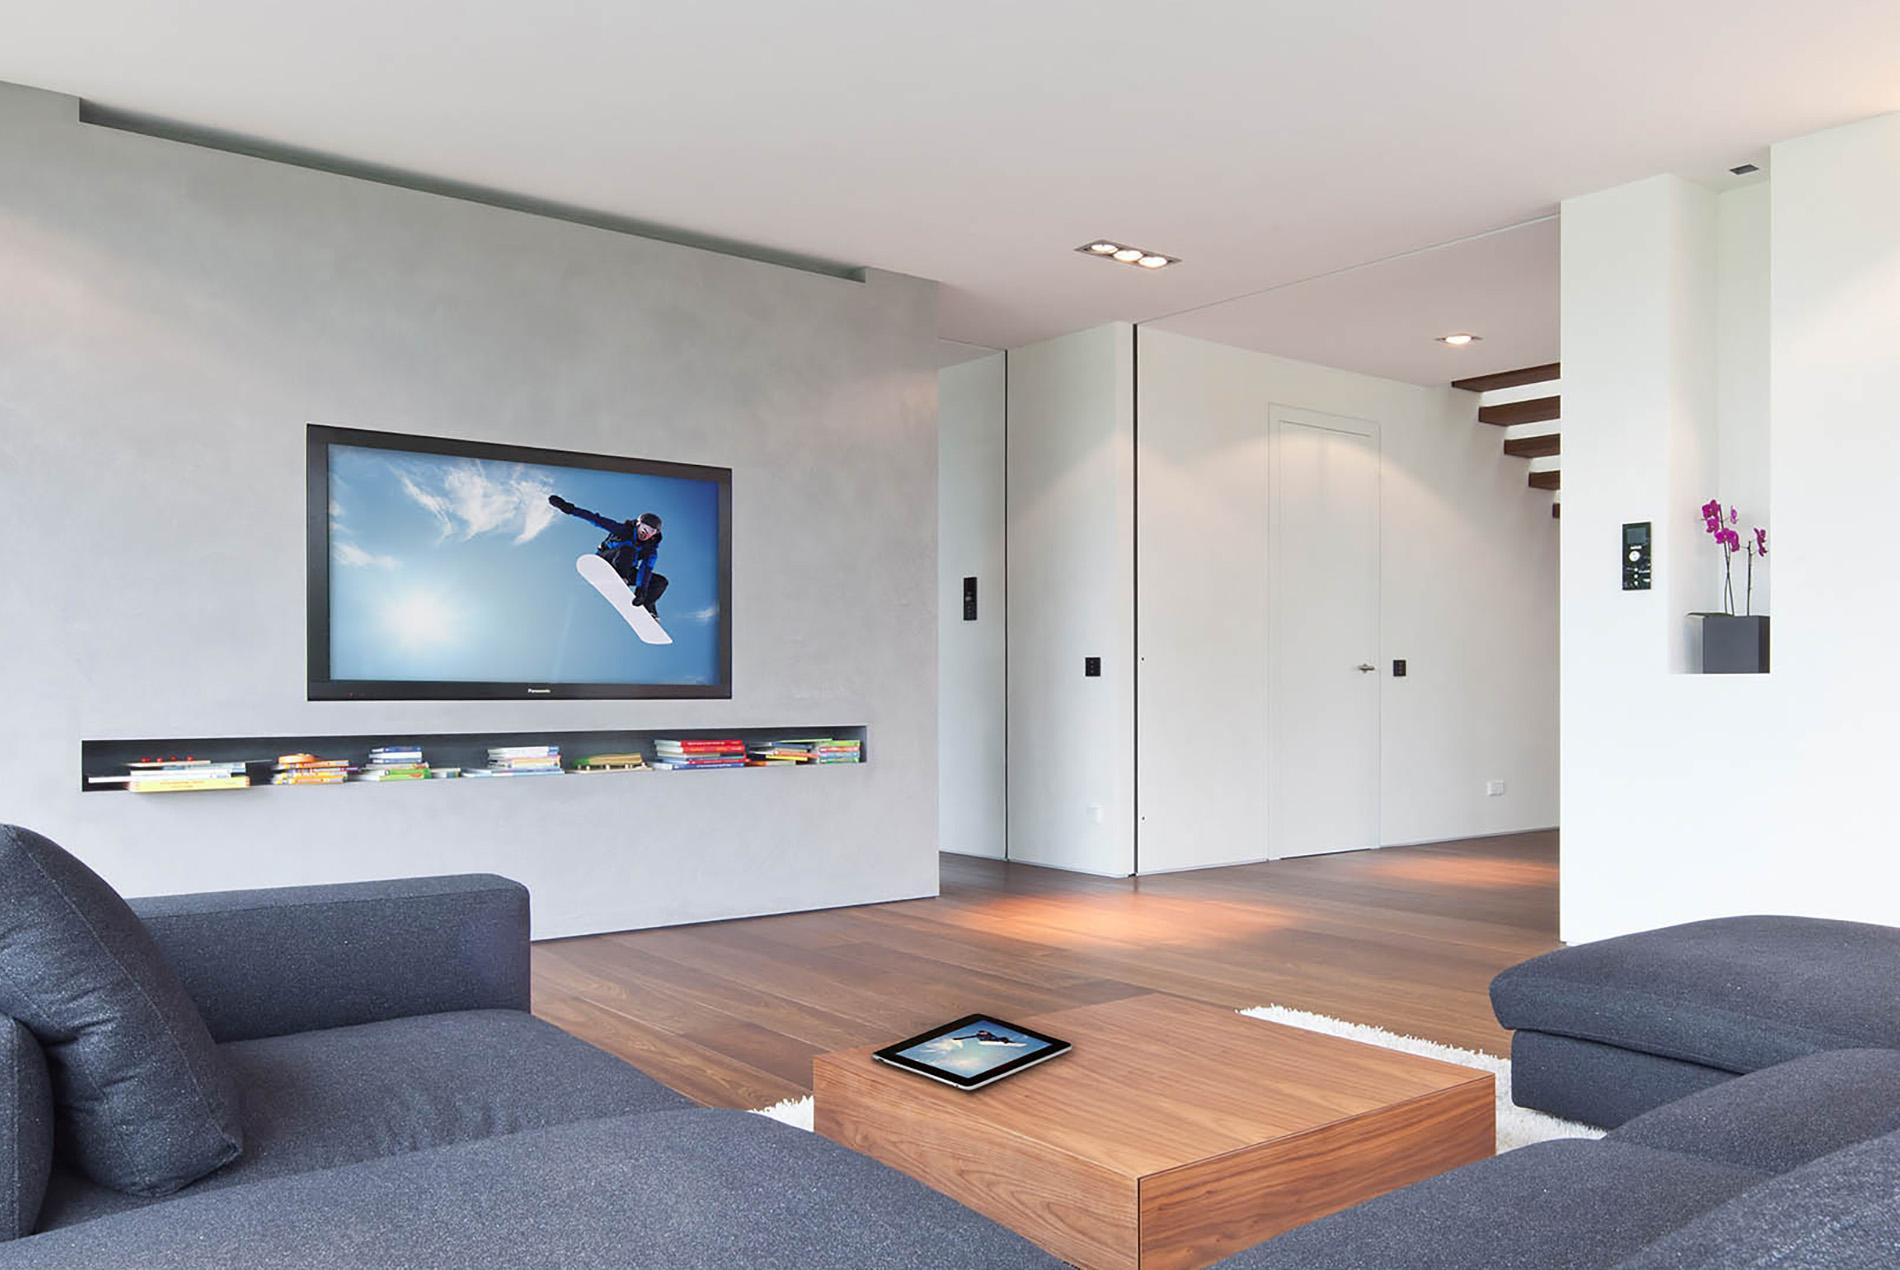 auditorium gmbh m nster partner der raumfabrik. Black Bedroom Furniture Sets. Home Design Ideas